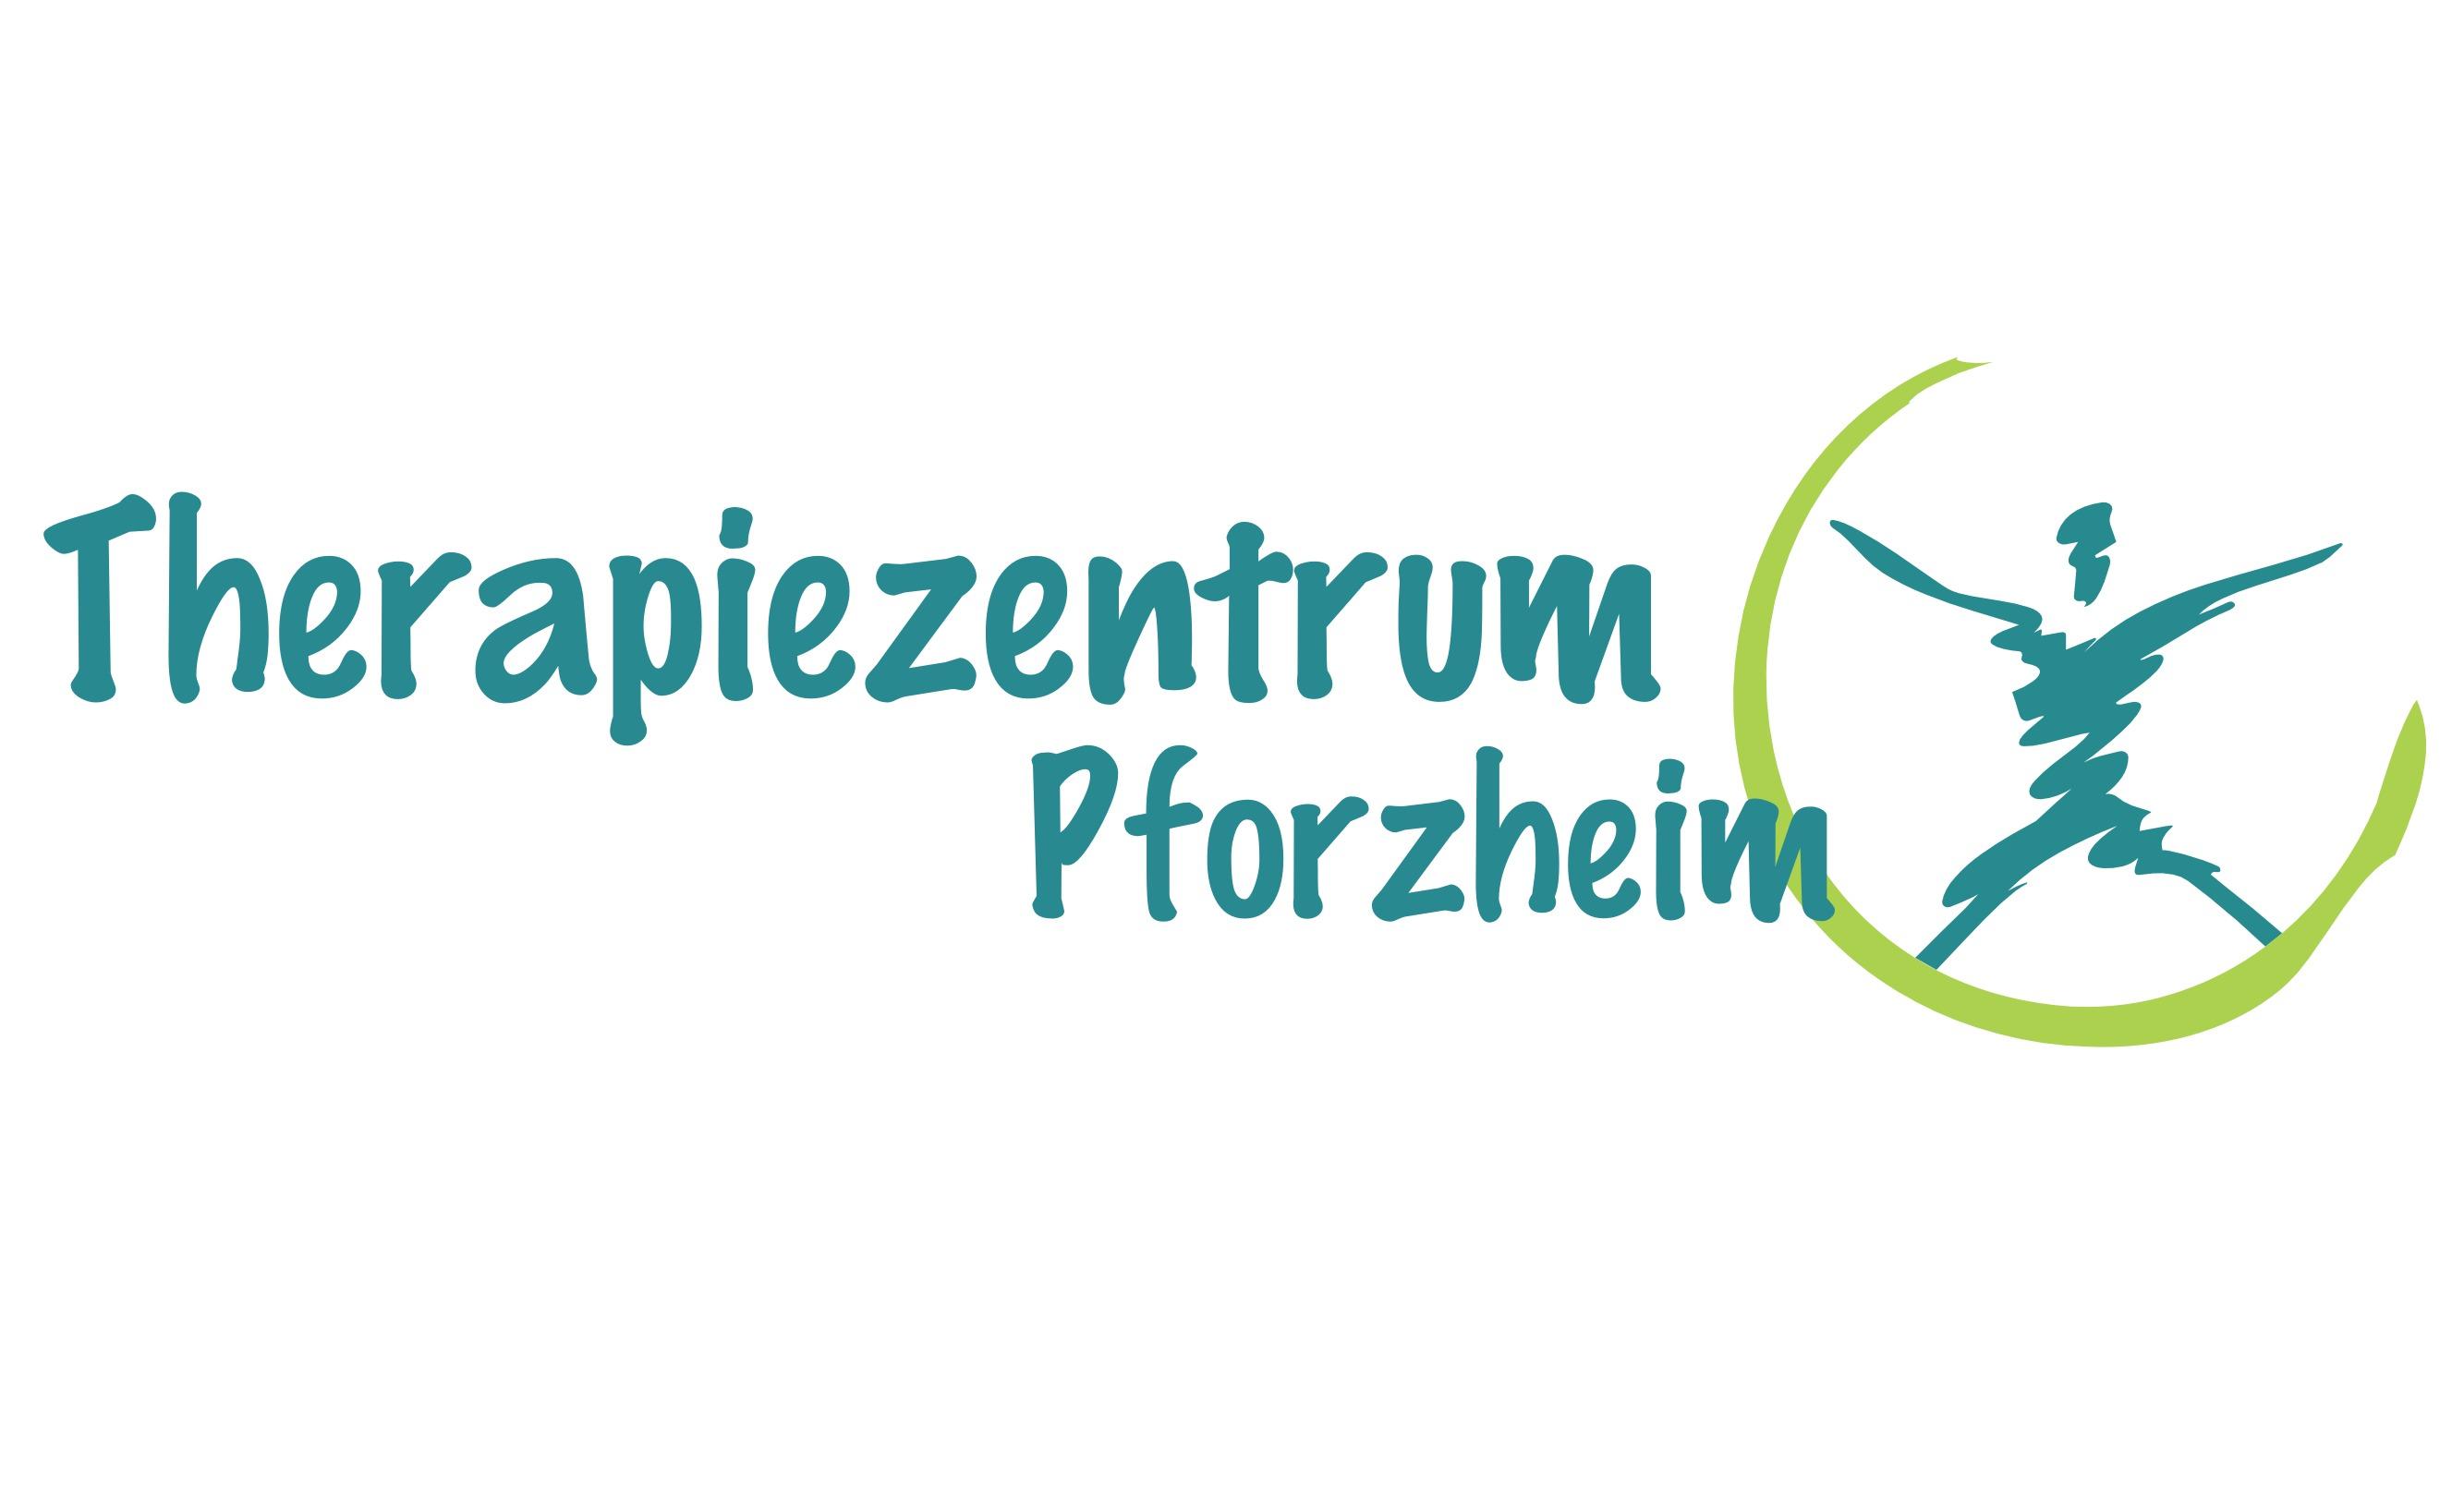 Therapiezentrum Pforzheim, Frau Andrea Voss